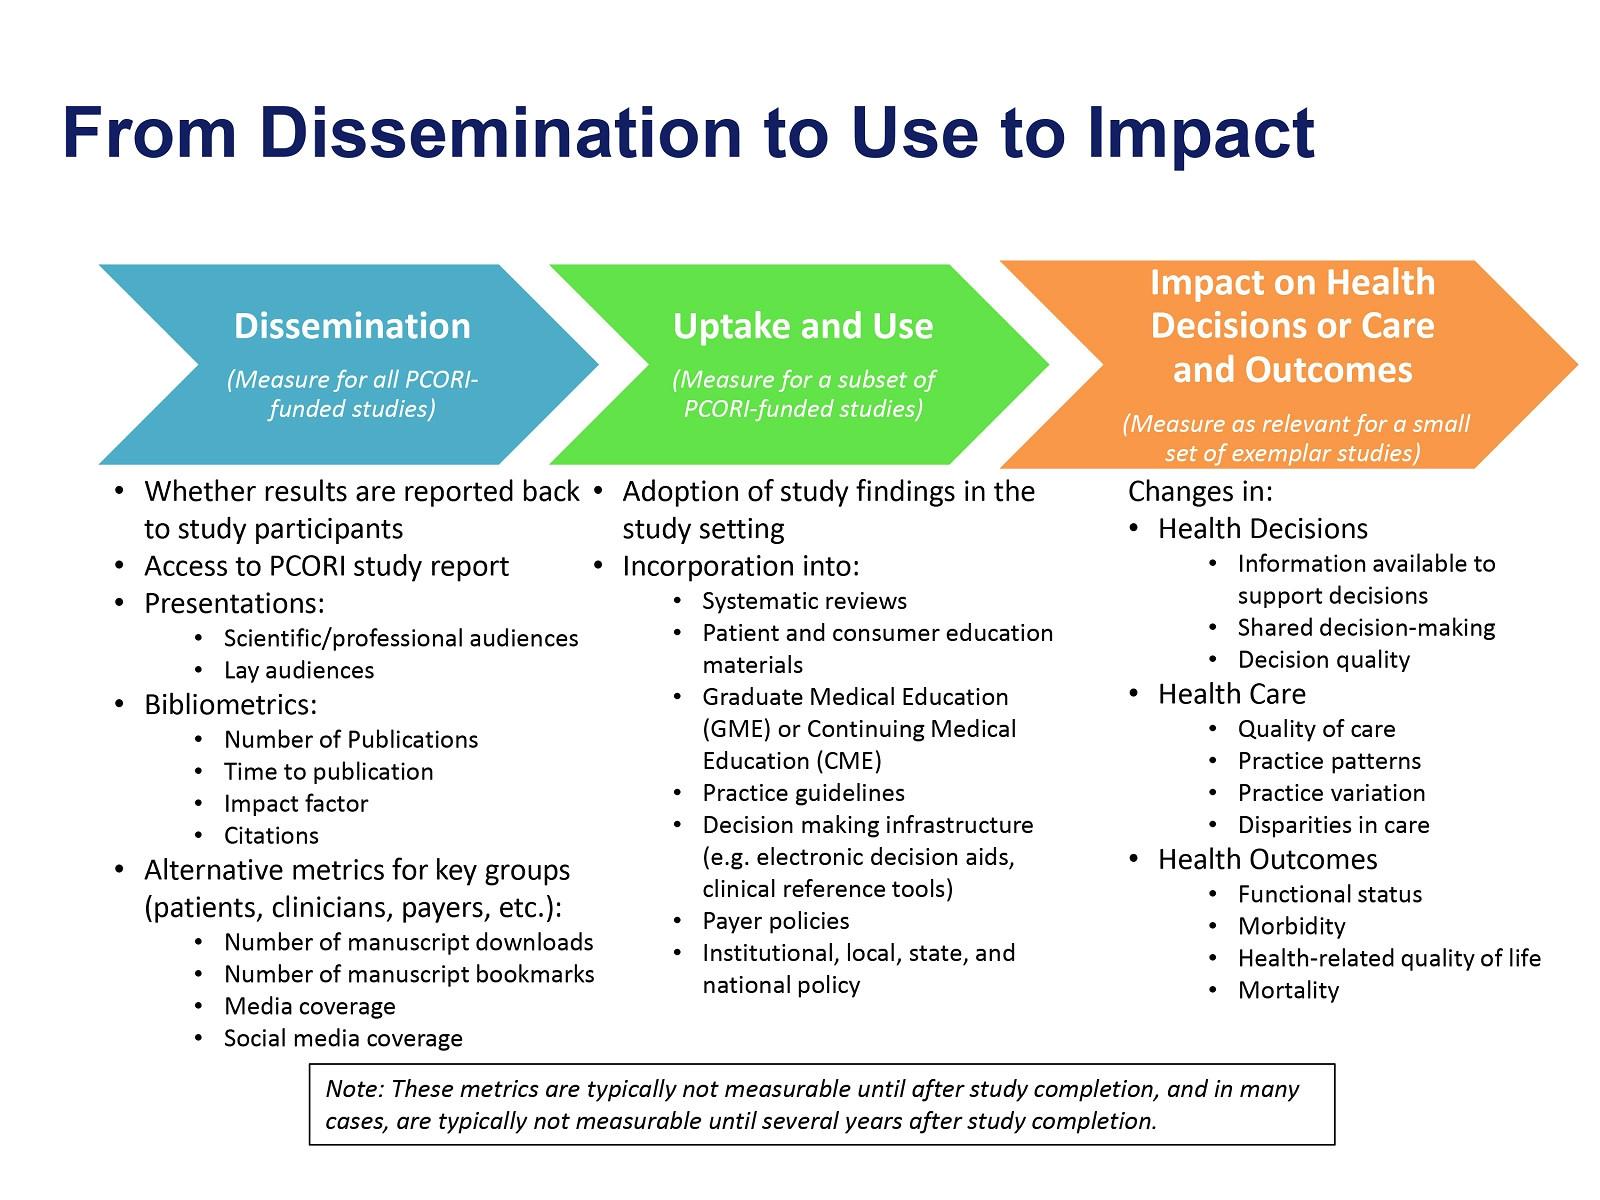 dissemination use impact evaluation graphic 1600x1200jpg